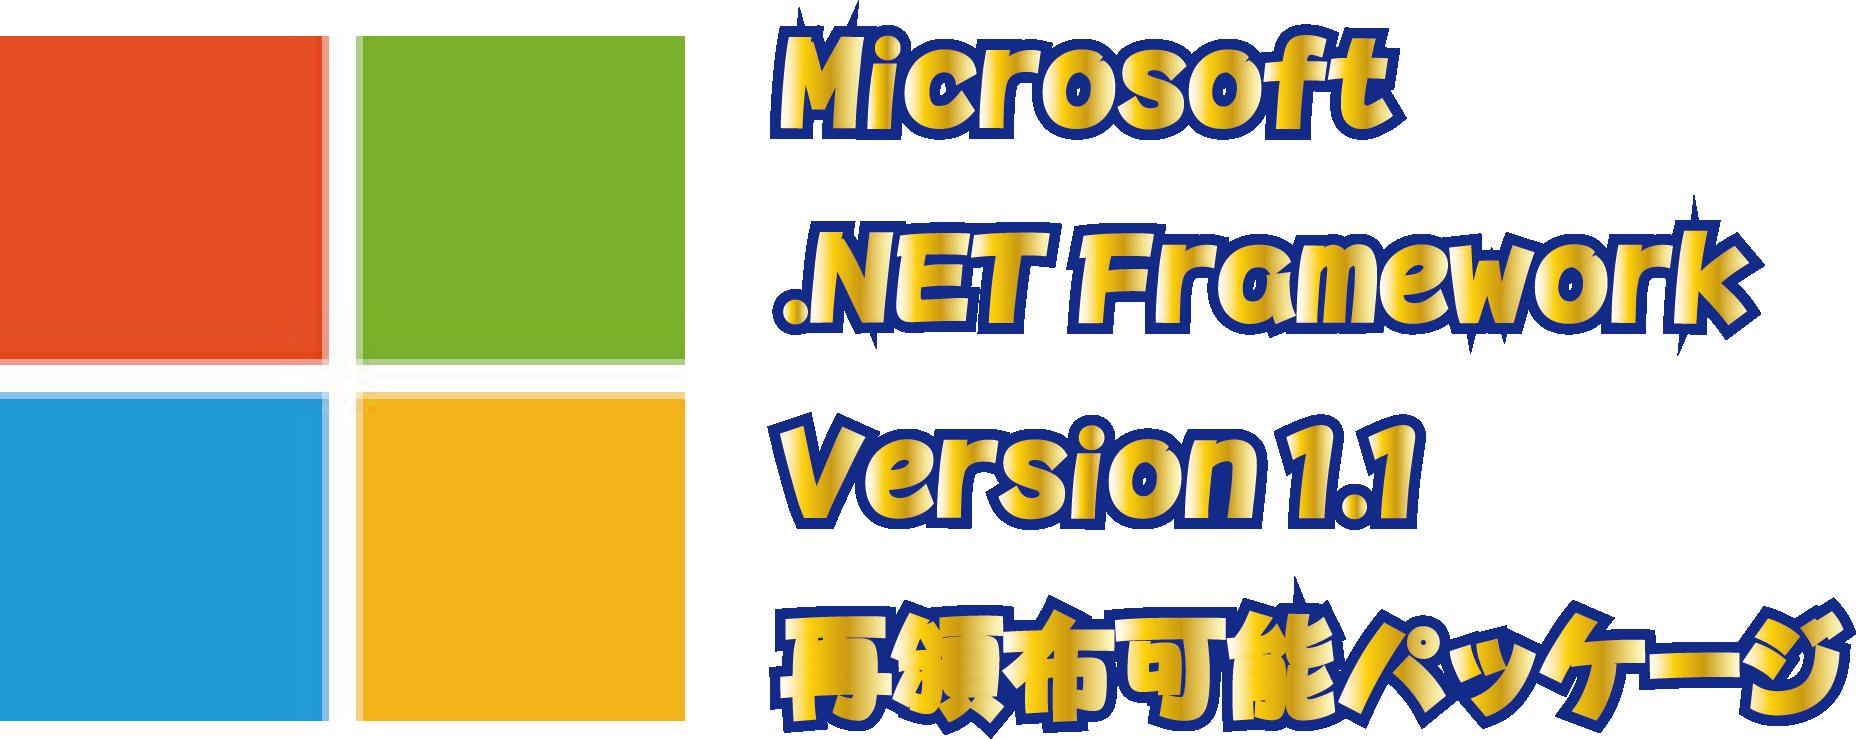 Microsoft NET Framework Version 1-1 再頒布可能パッケージロゴ